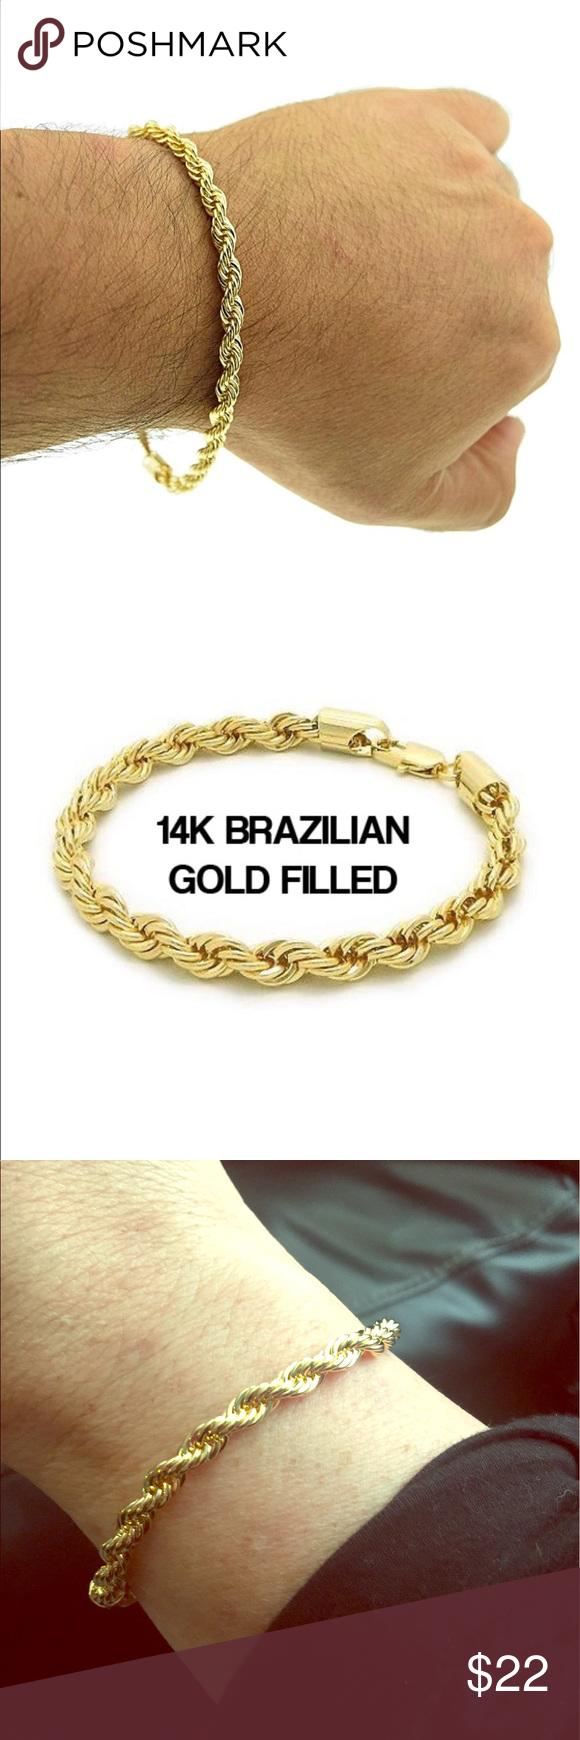 14k Brazilian Gold Filled Twist Rope Bracelet Boutique Bracelets